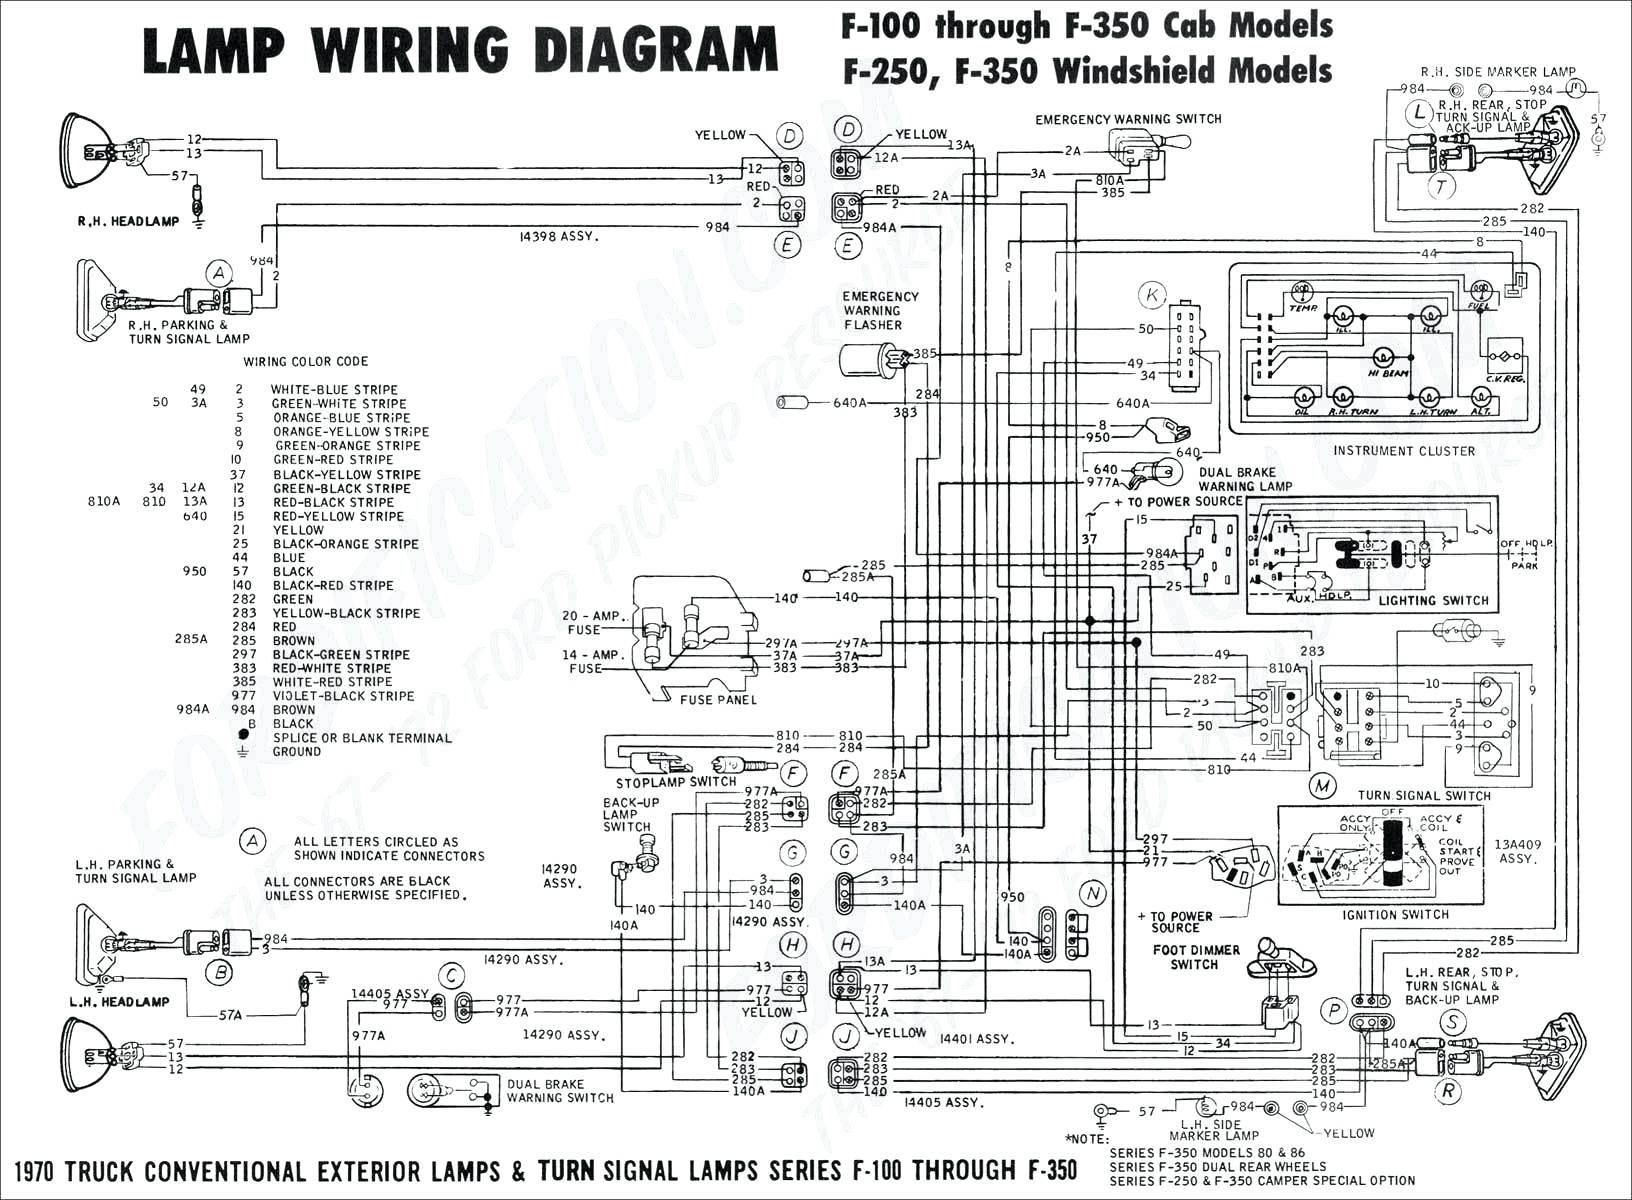 2016 Ram 1500 Tail Light Wire Diagram Elegant